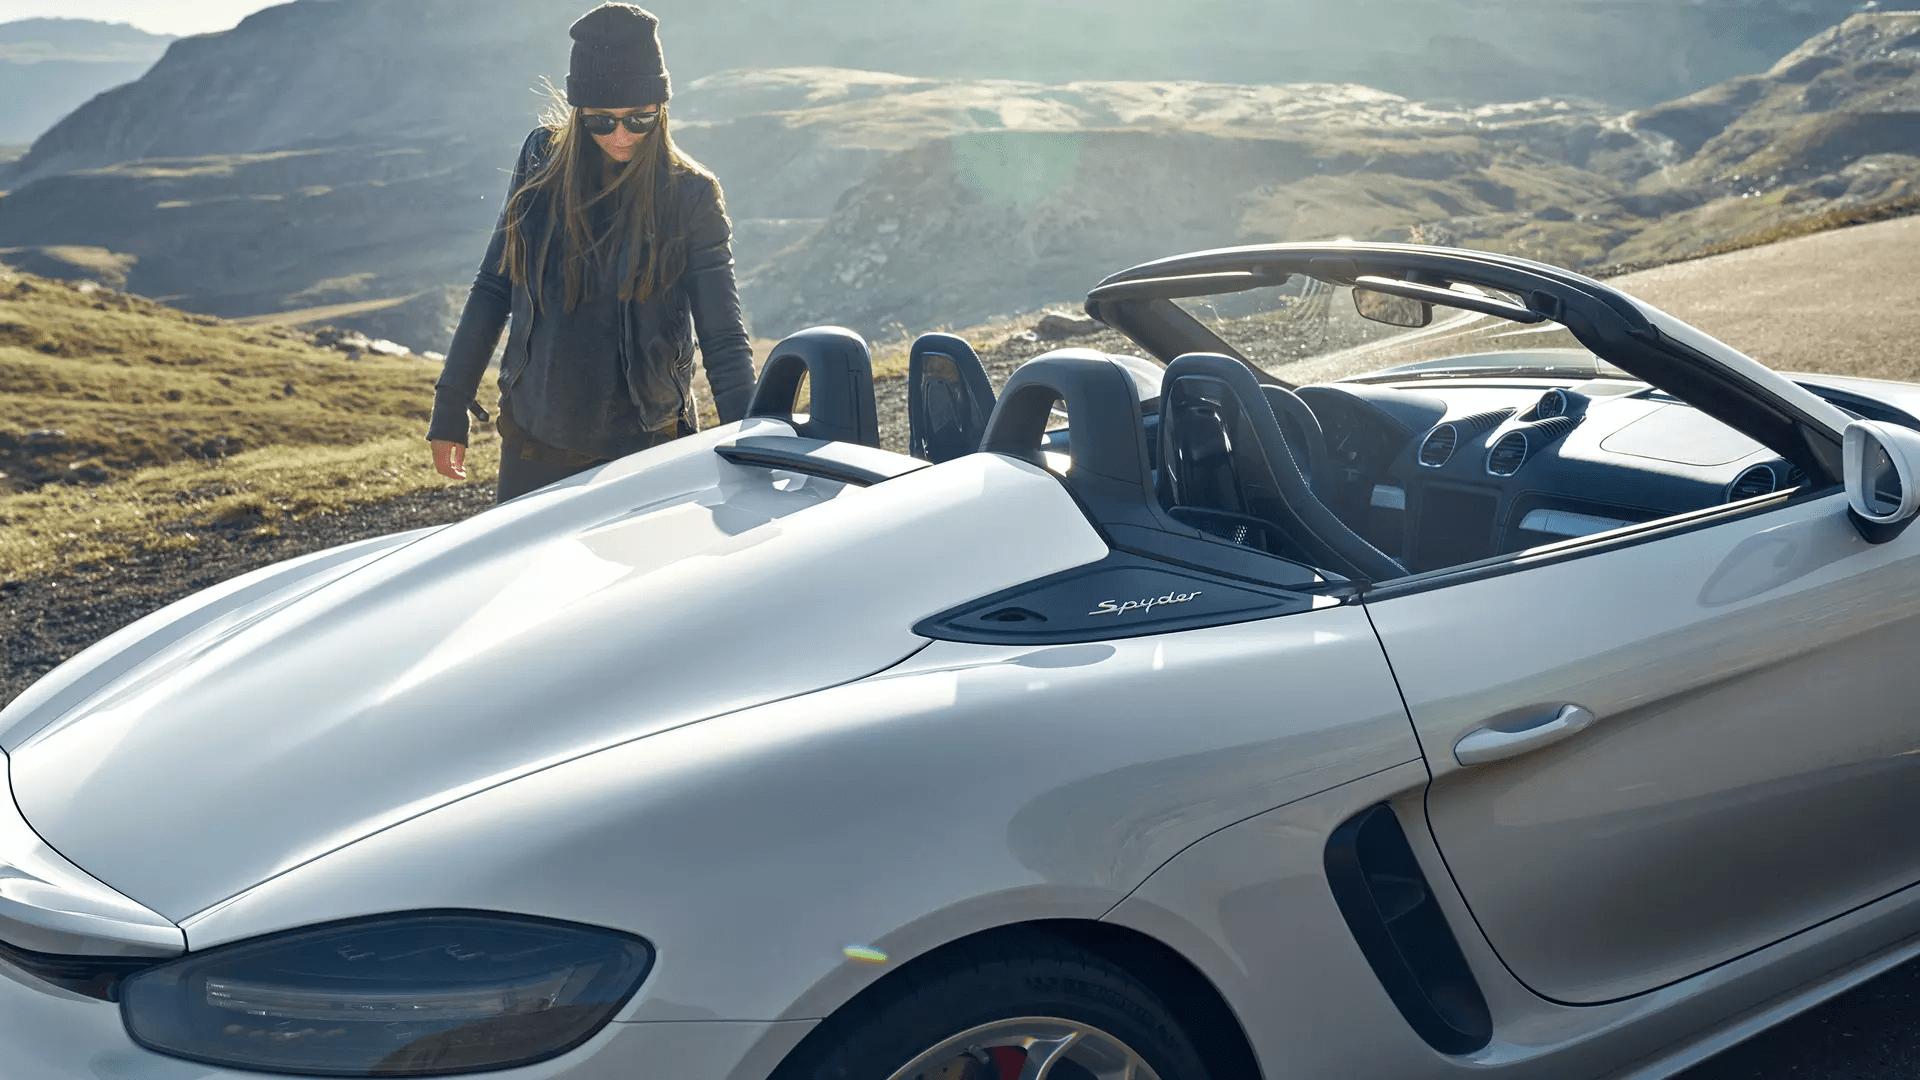 2020 Porsche 718 Spyder Exterior